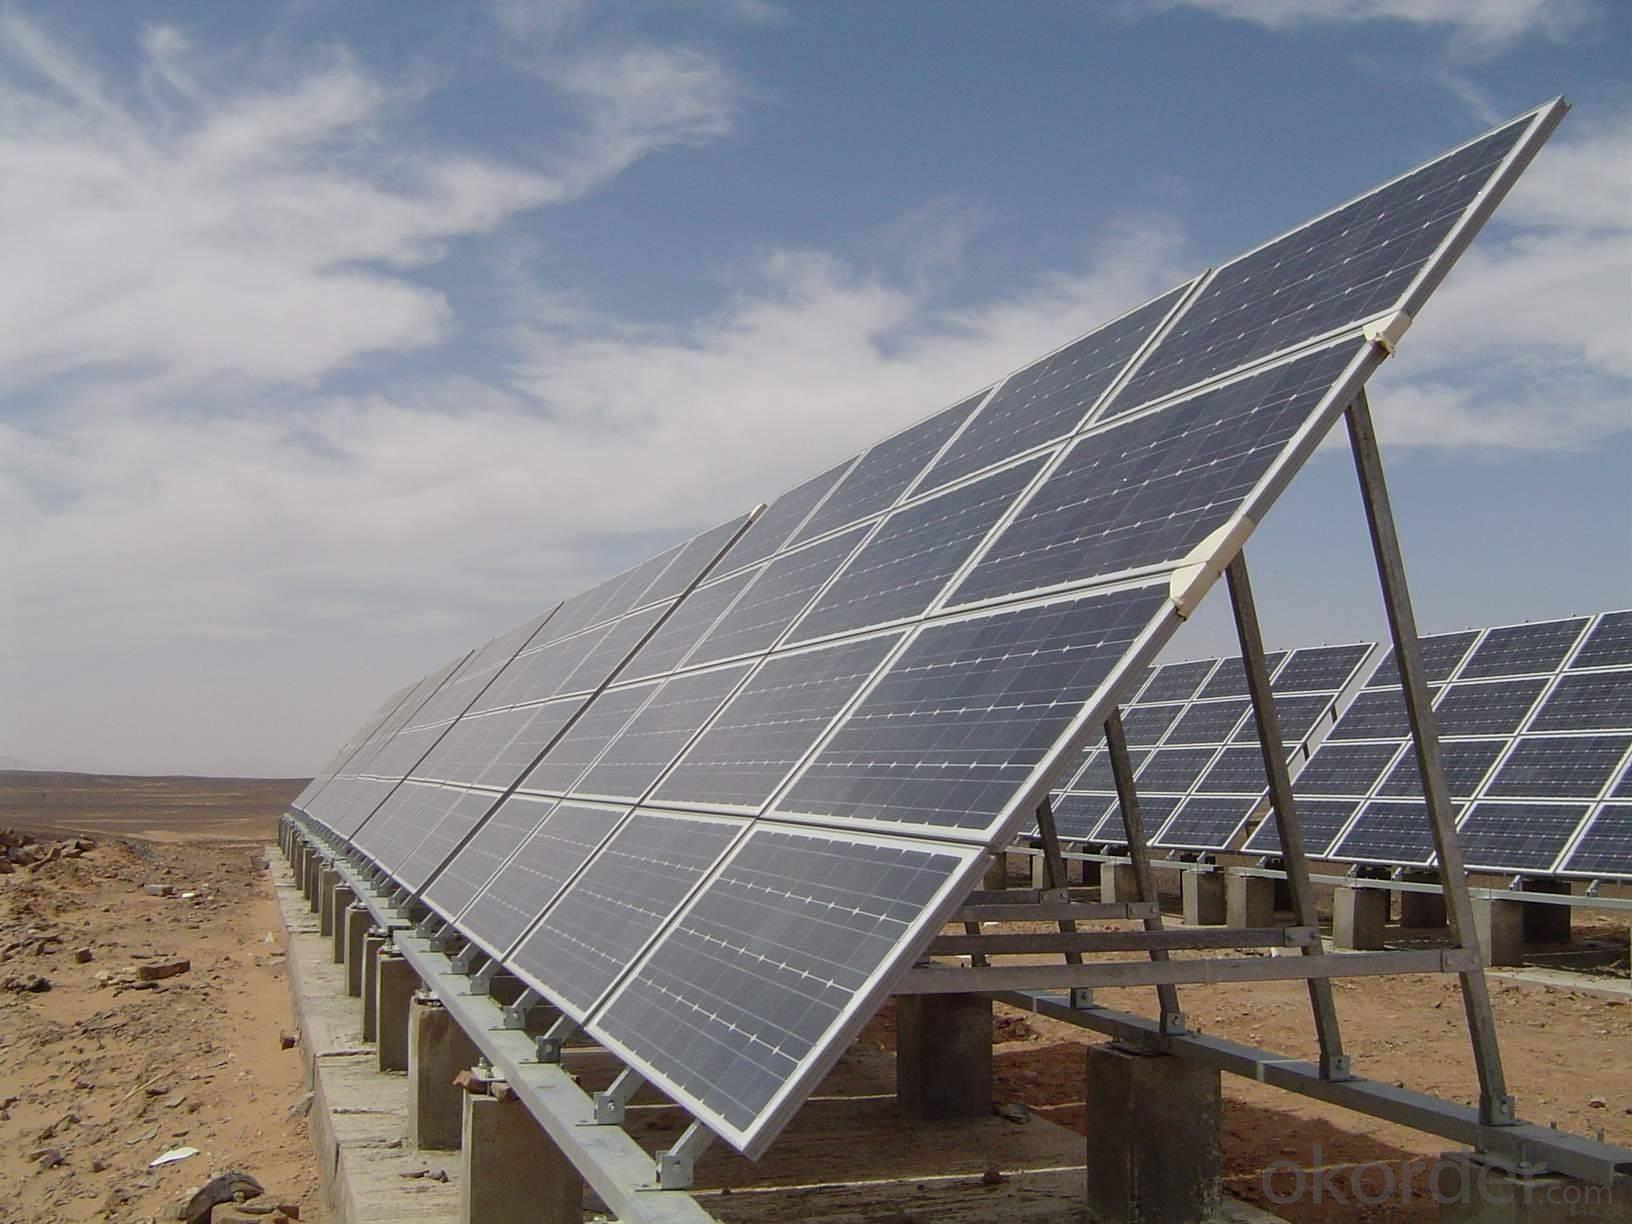 CNBM Solar Monocrystalline 156 Series 130W